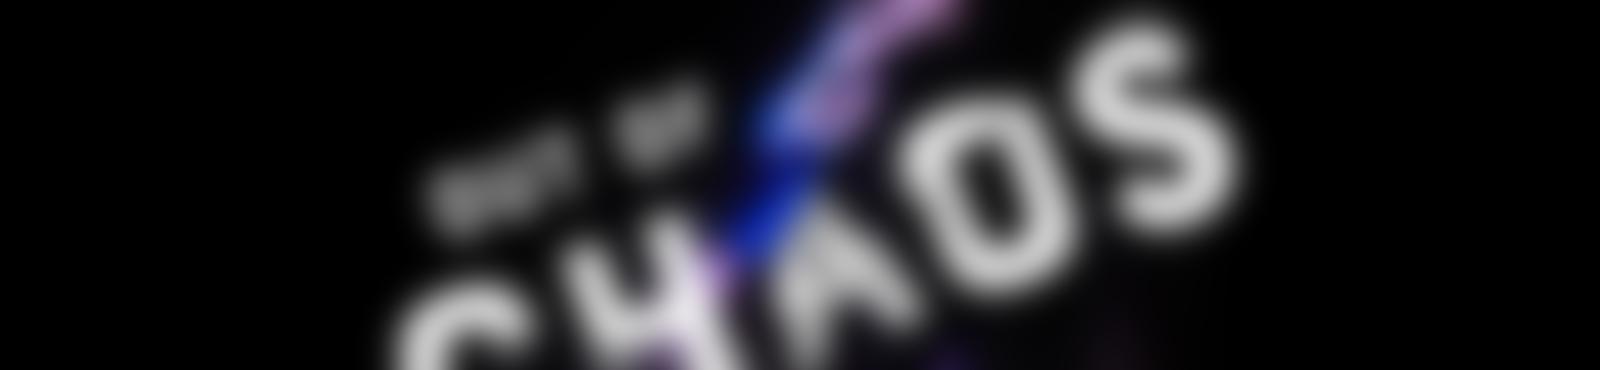 Blurred e7e44c84 e365 450c 8ff7 a98da6b7b999